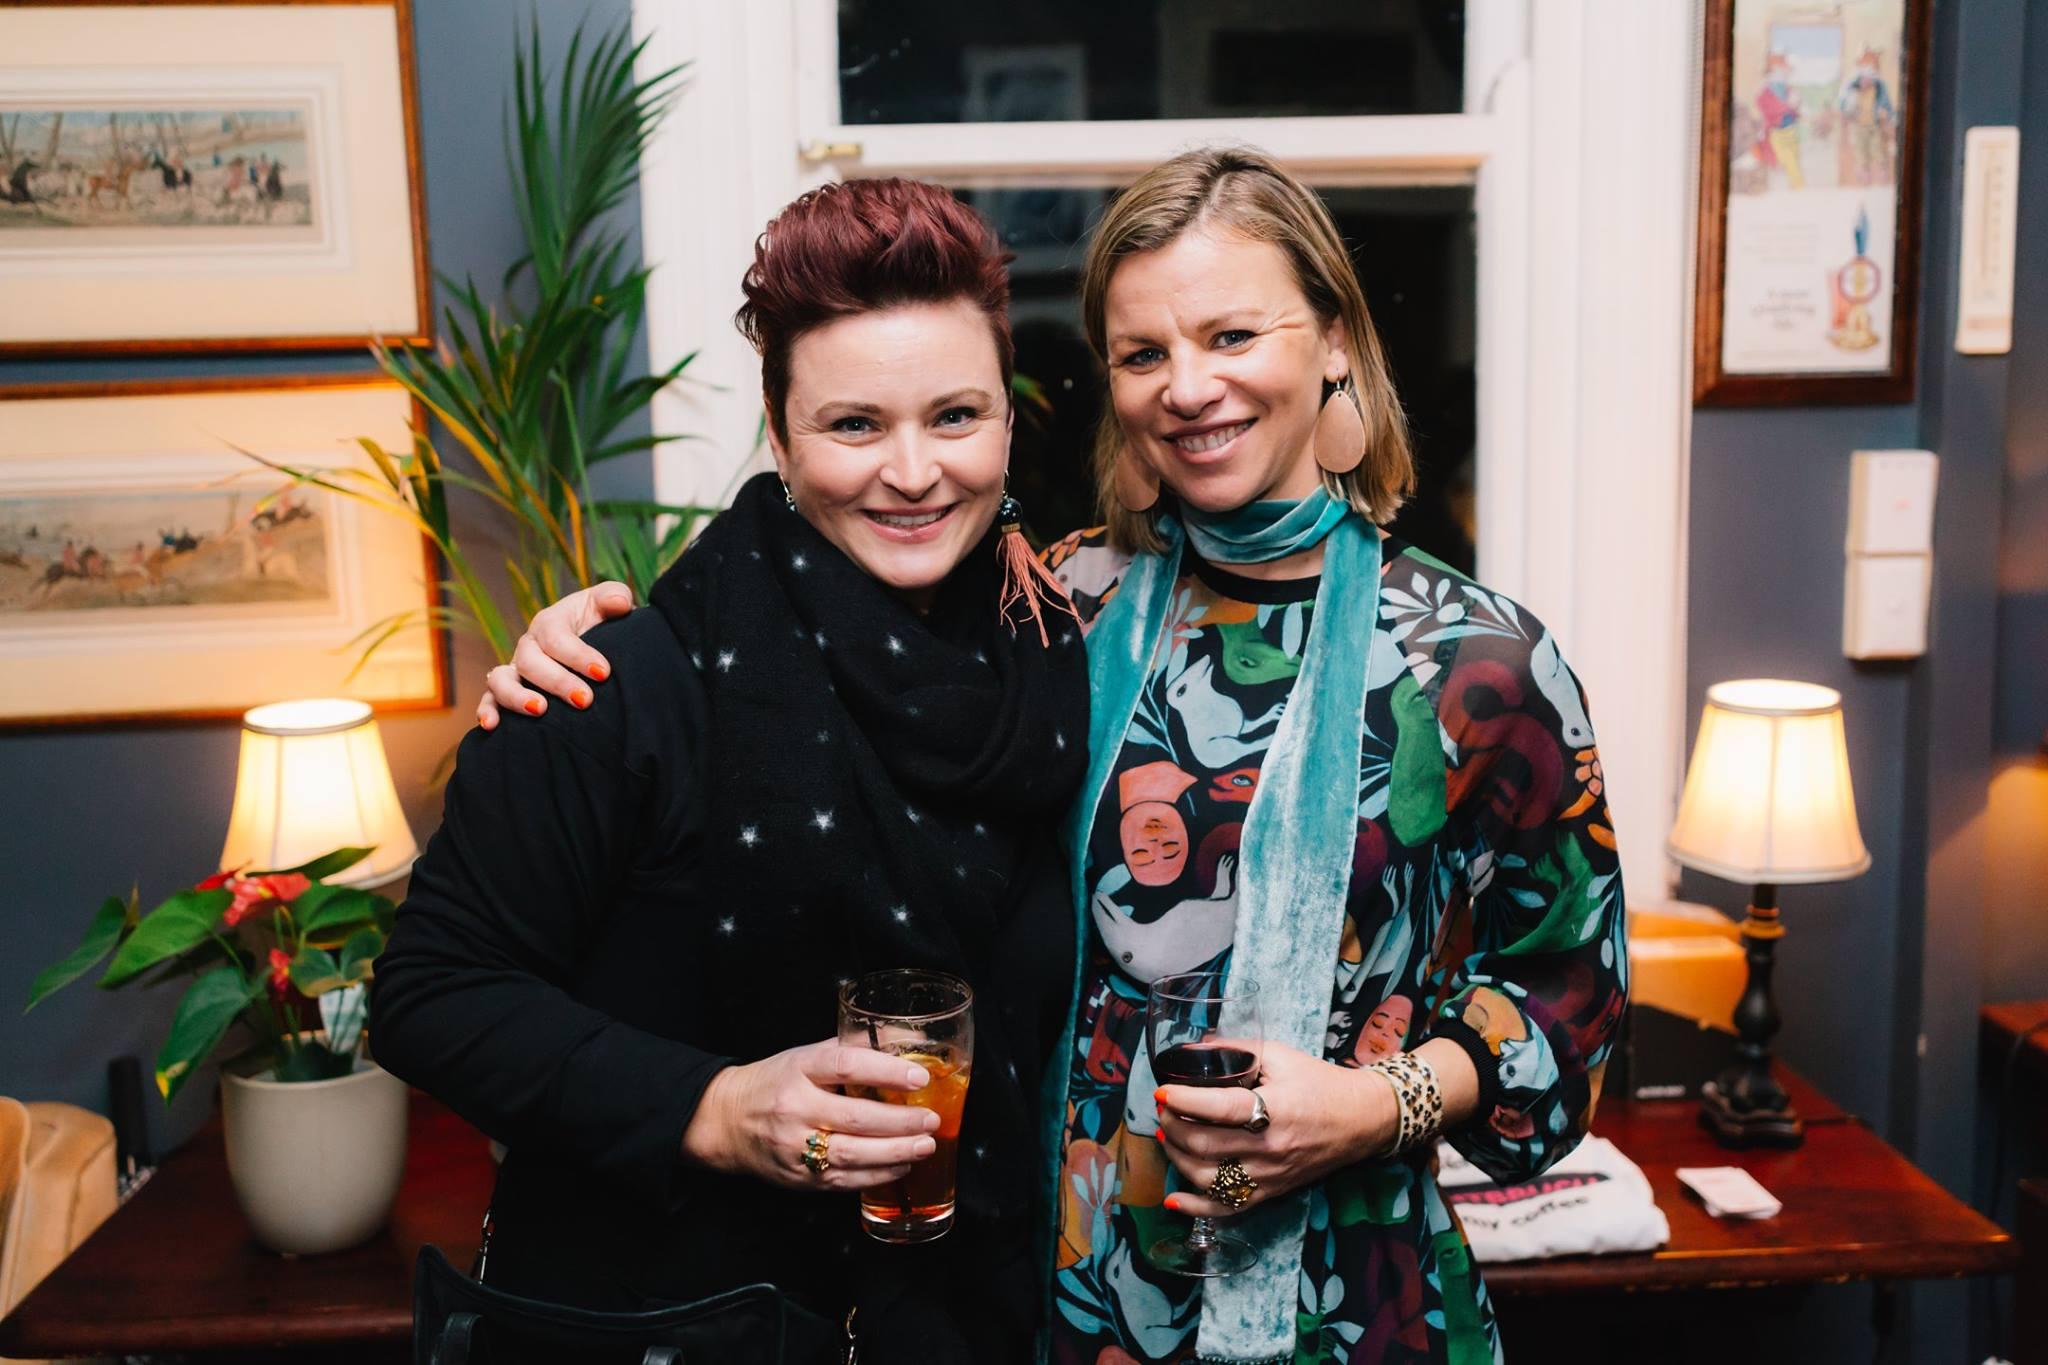 Curator Sophie Vander with our fabulous featured mama presenter artist Jasmine Mansbridge.